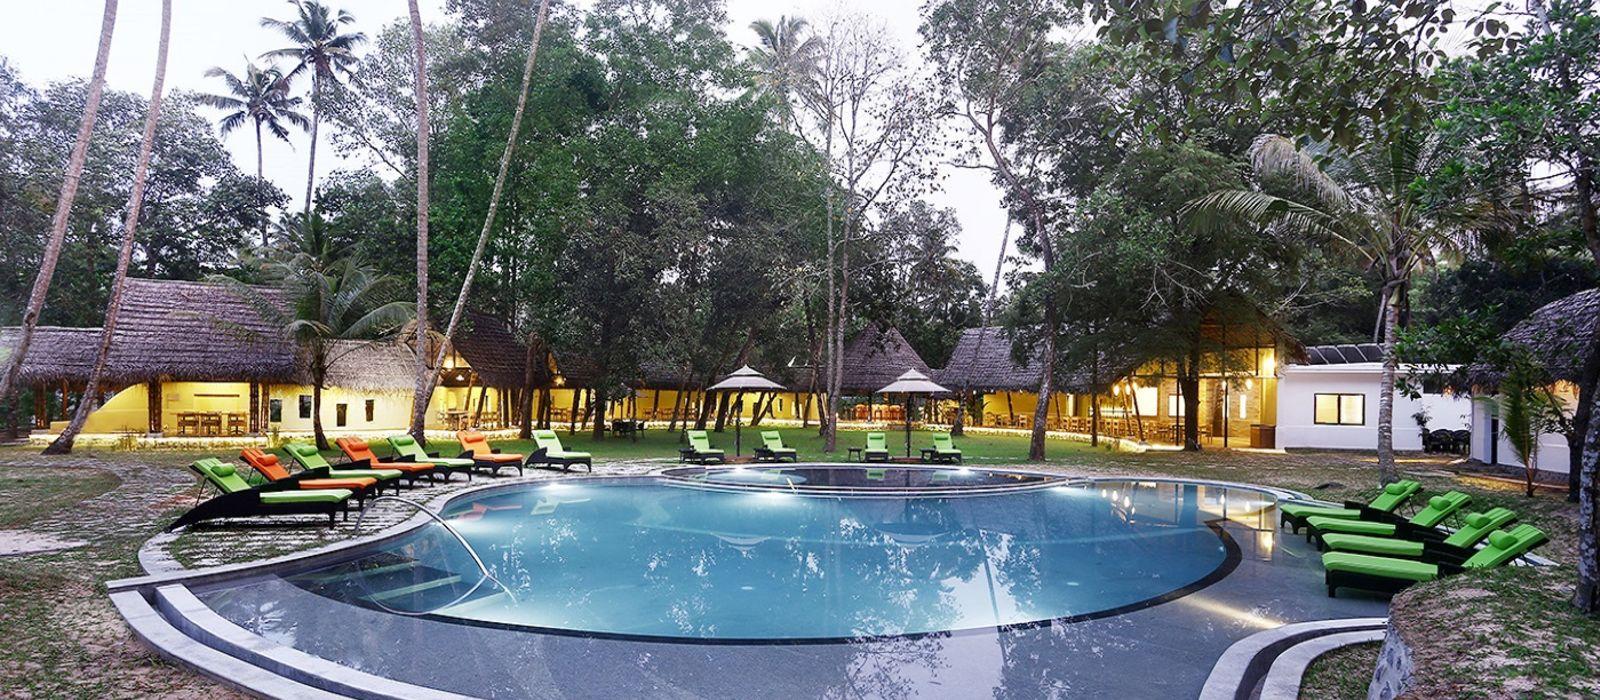 Hotel Xandari Pearl South India